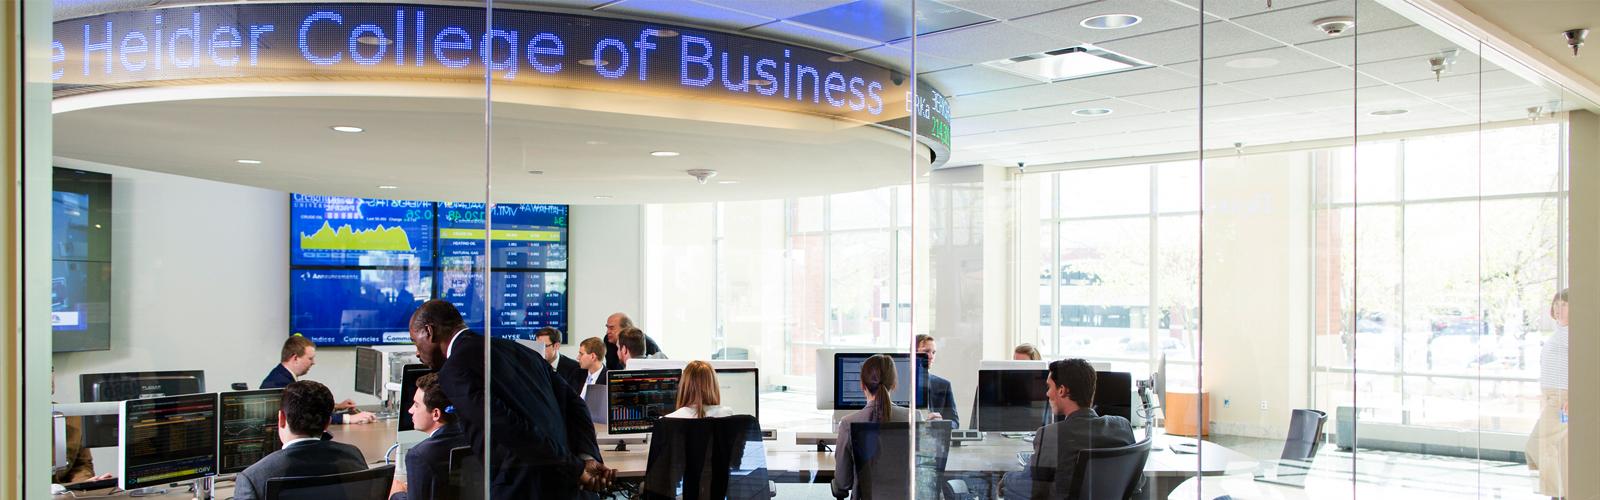 Heider Securities Investment and Analysis Center, Creighton university